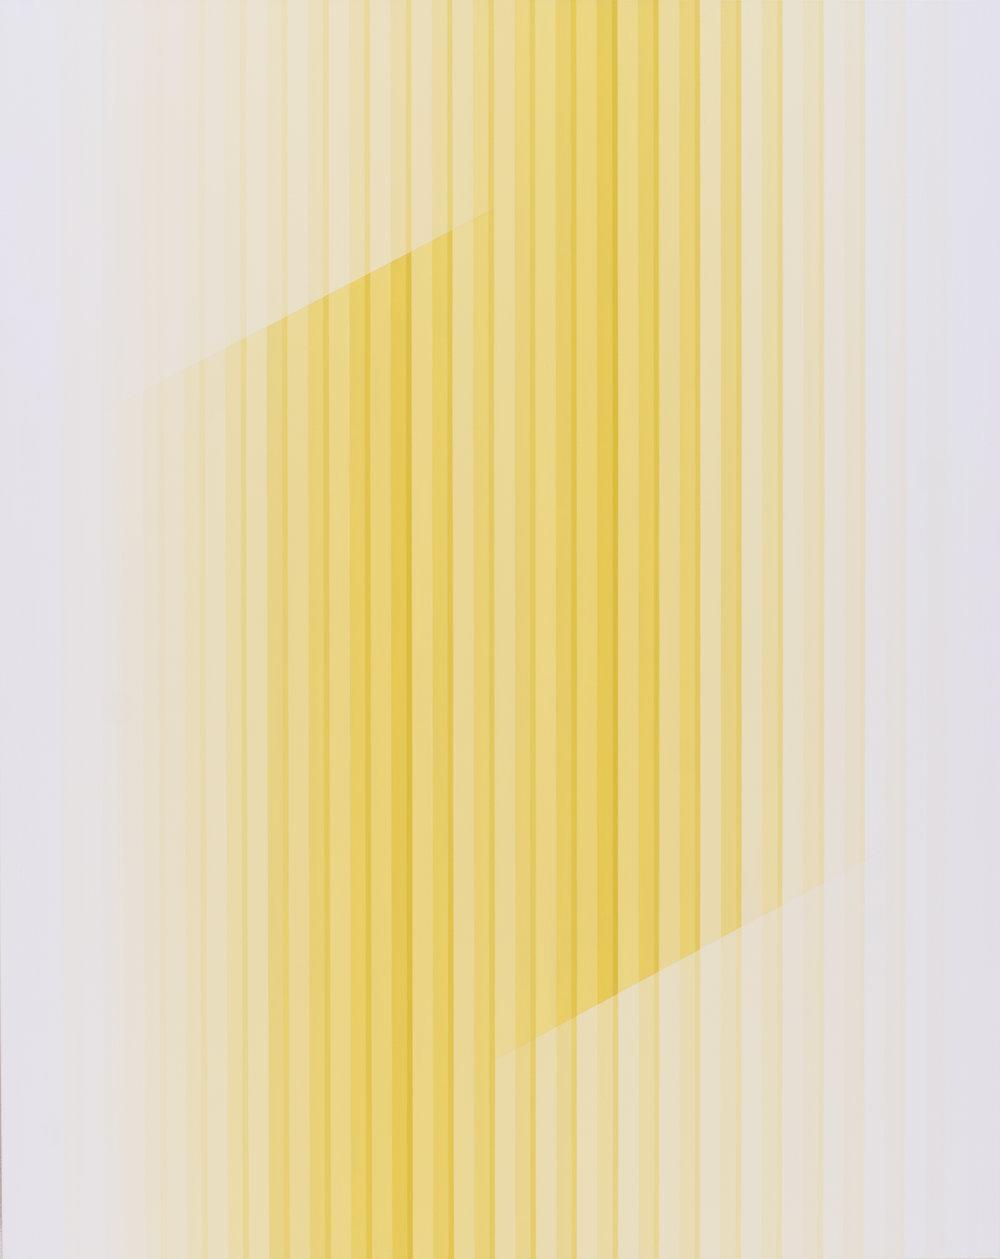 Miok Chung, Transition 1621 ,73x91cm, acrylic on canvas, 2016